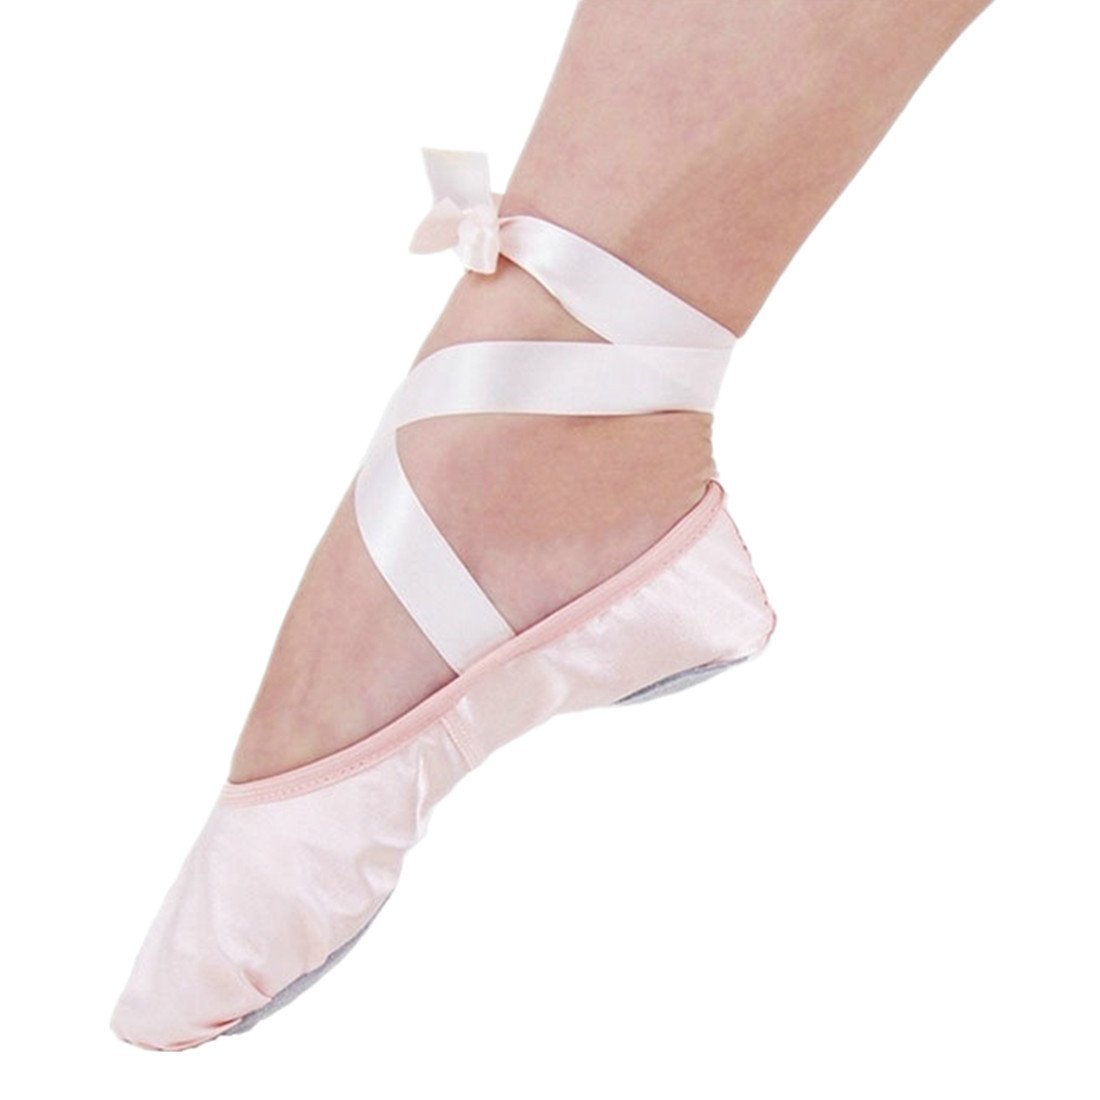 Girls Pink Ballet Dance Shoes Split Sole with Satin Ballet Slippers Flats Gymnastics Shoes BA01 7 M Big Kid/Women